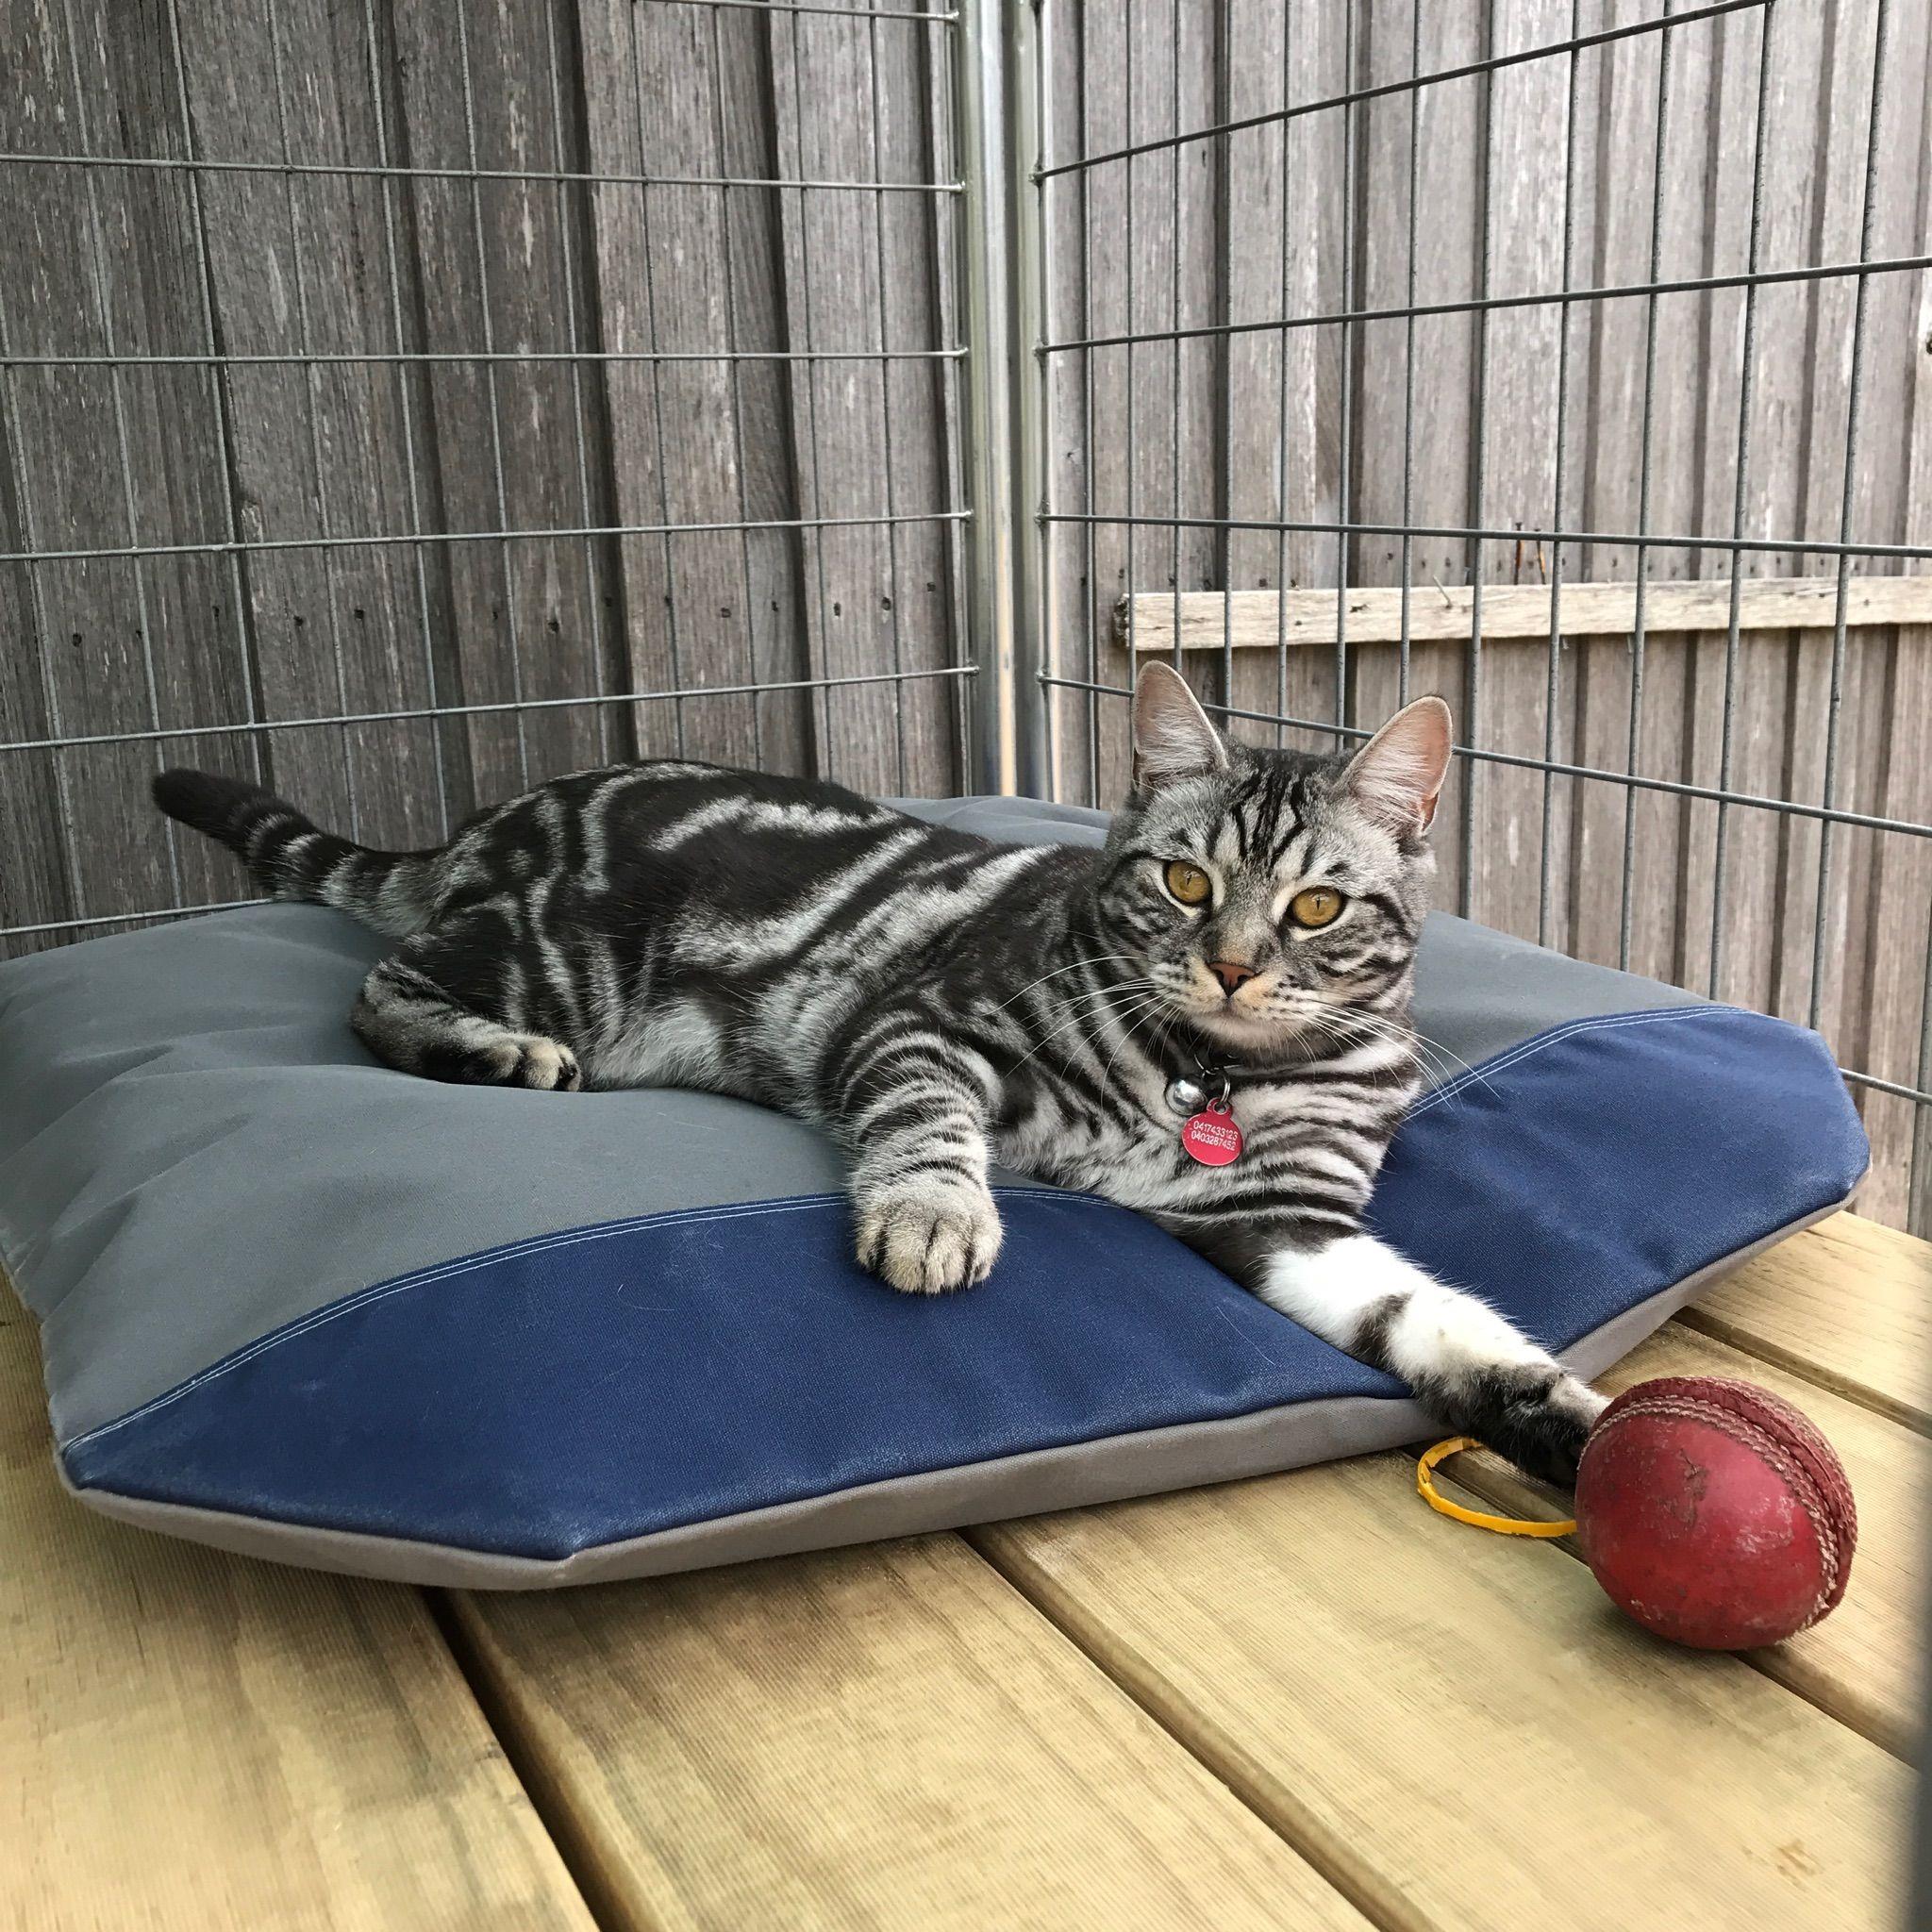 Coopers Per Covers Super tough Pet Beds That's one big Cat